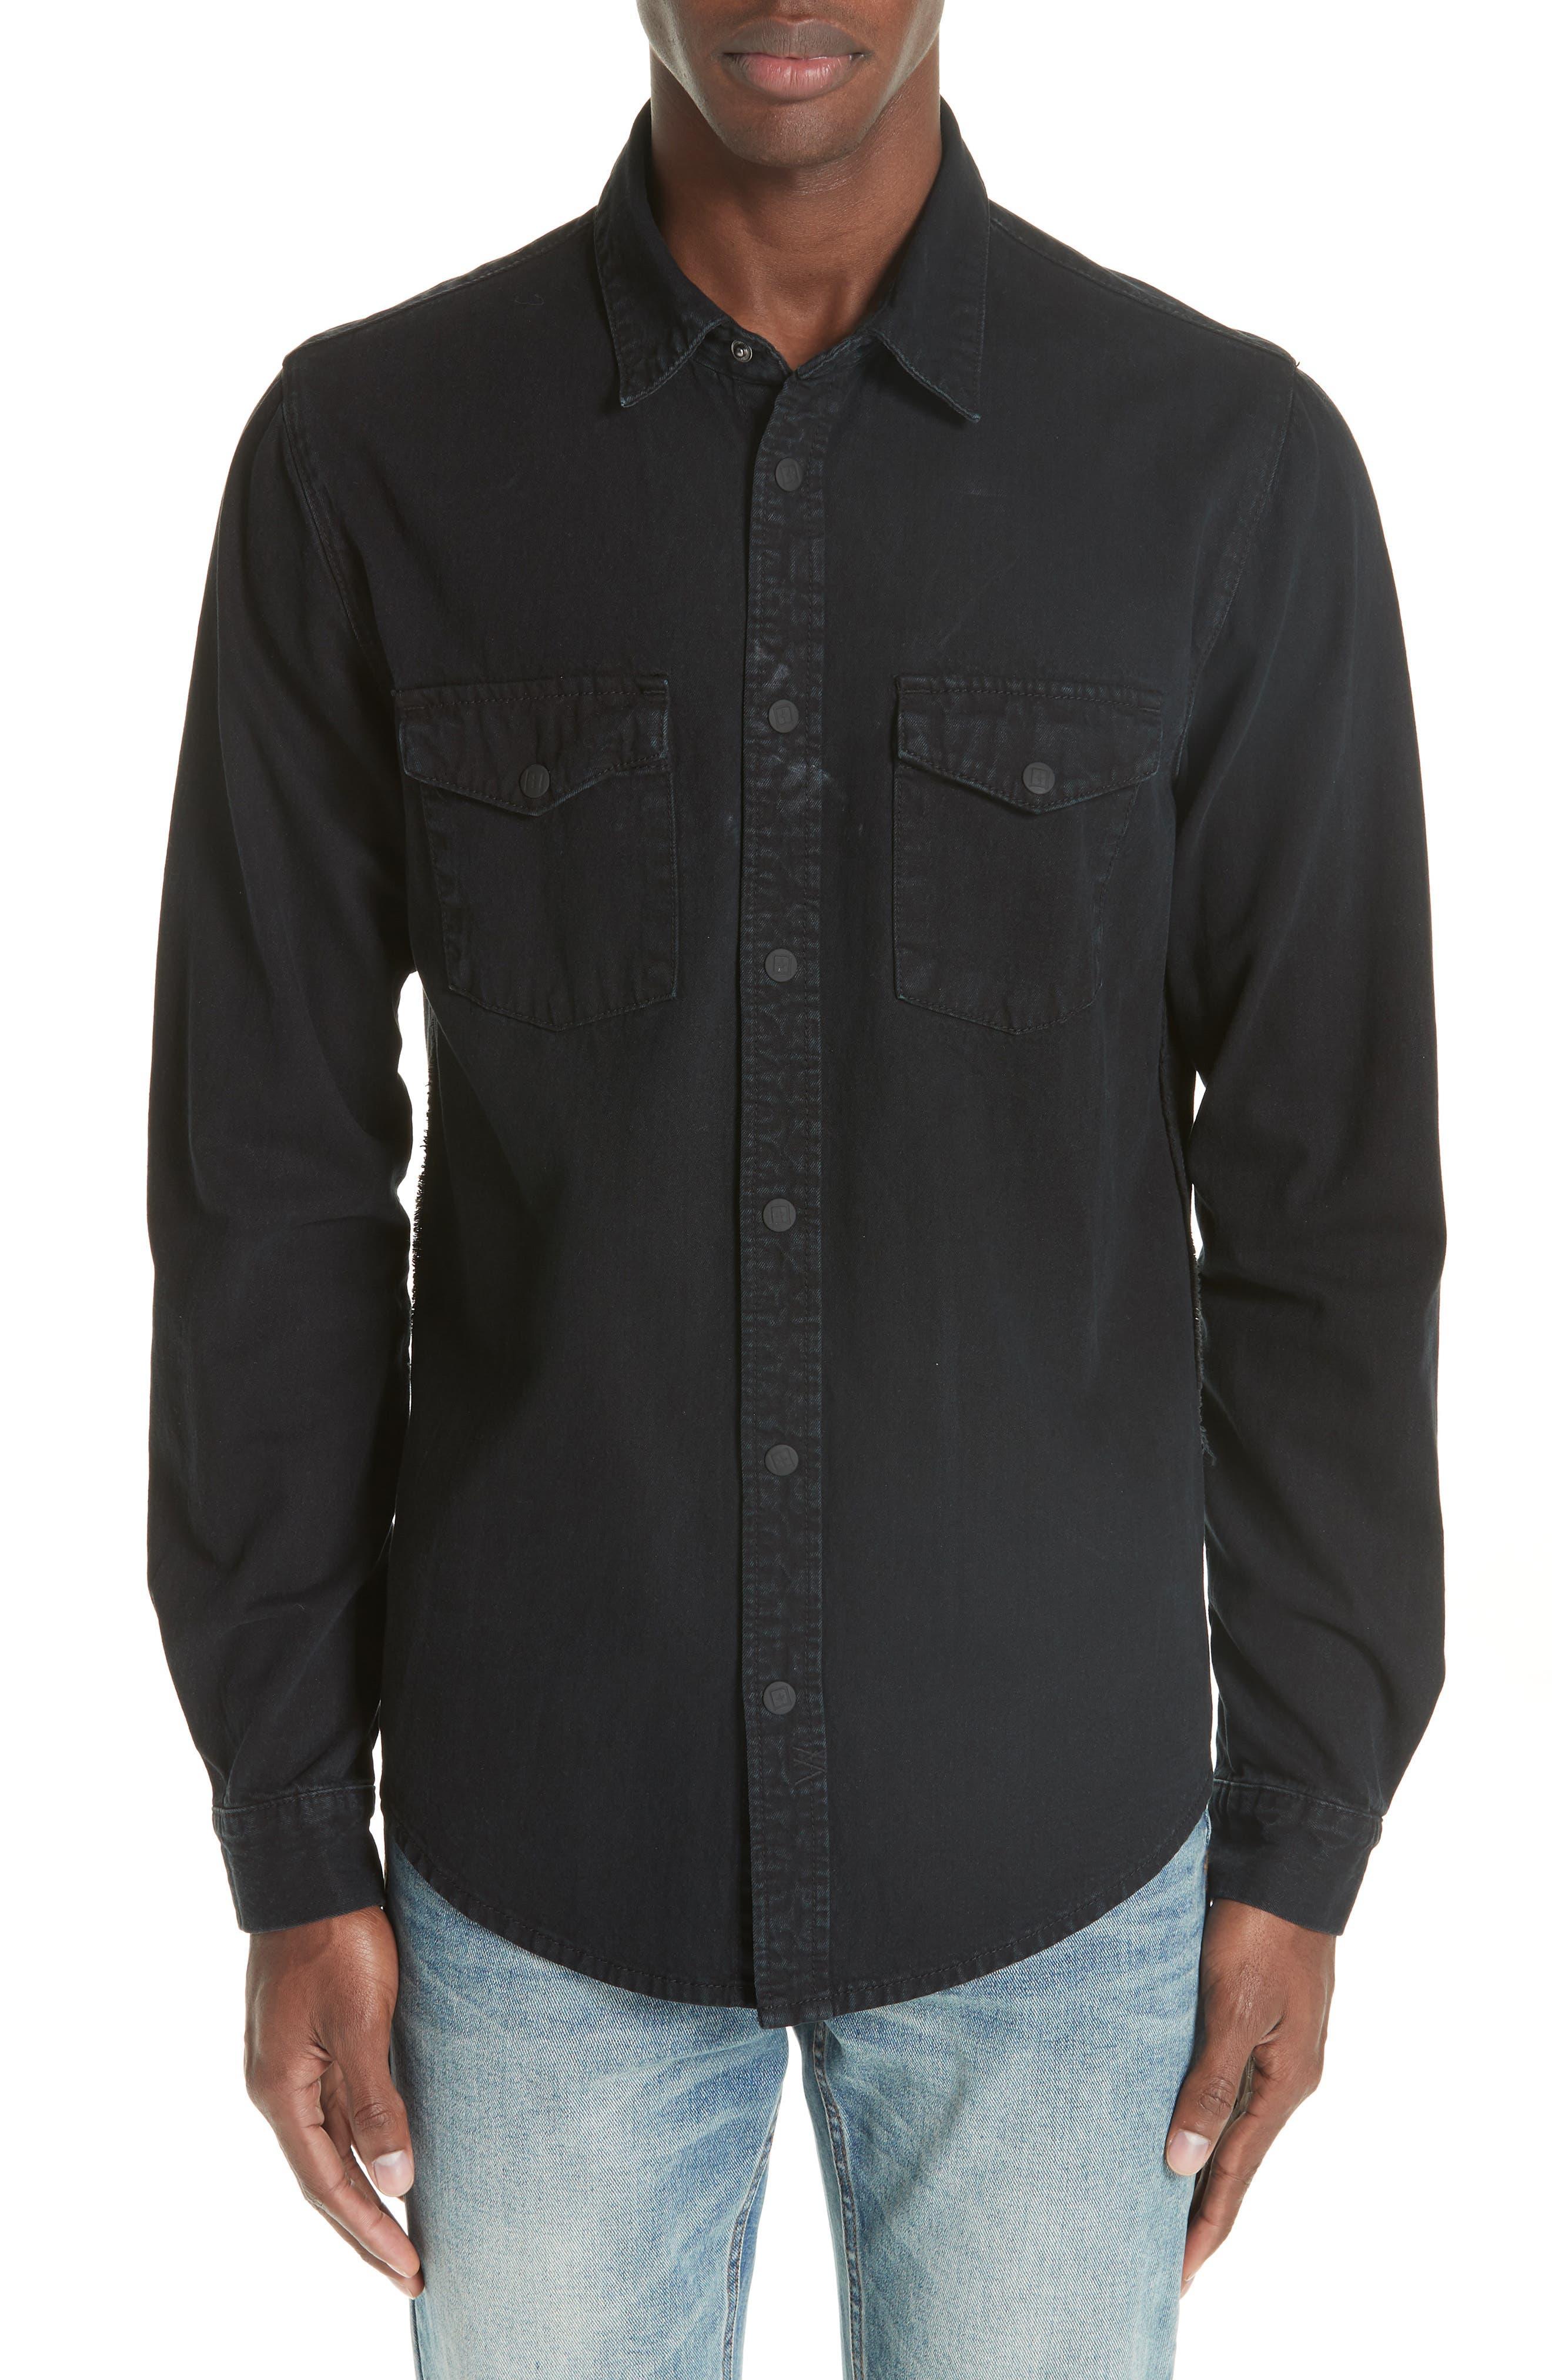 Frontier Work Shirt,                             Main thumbnail 1, color,                             BLACK